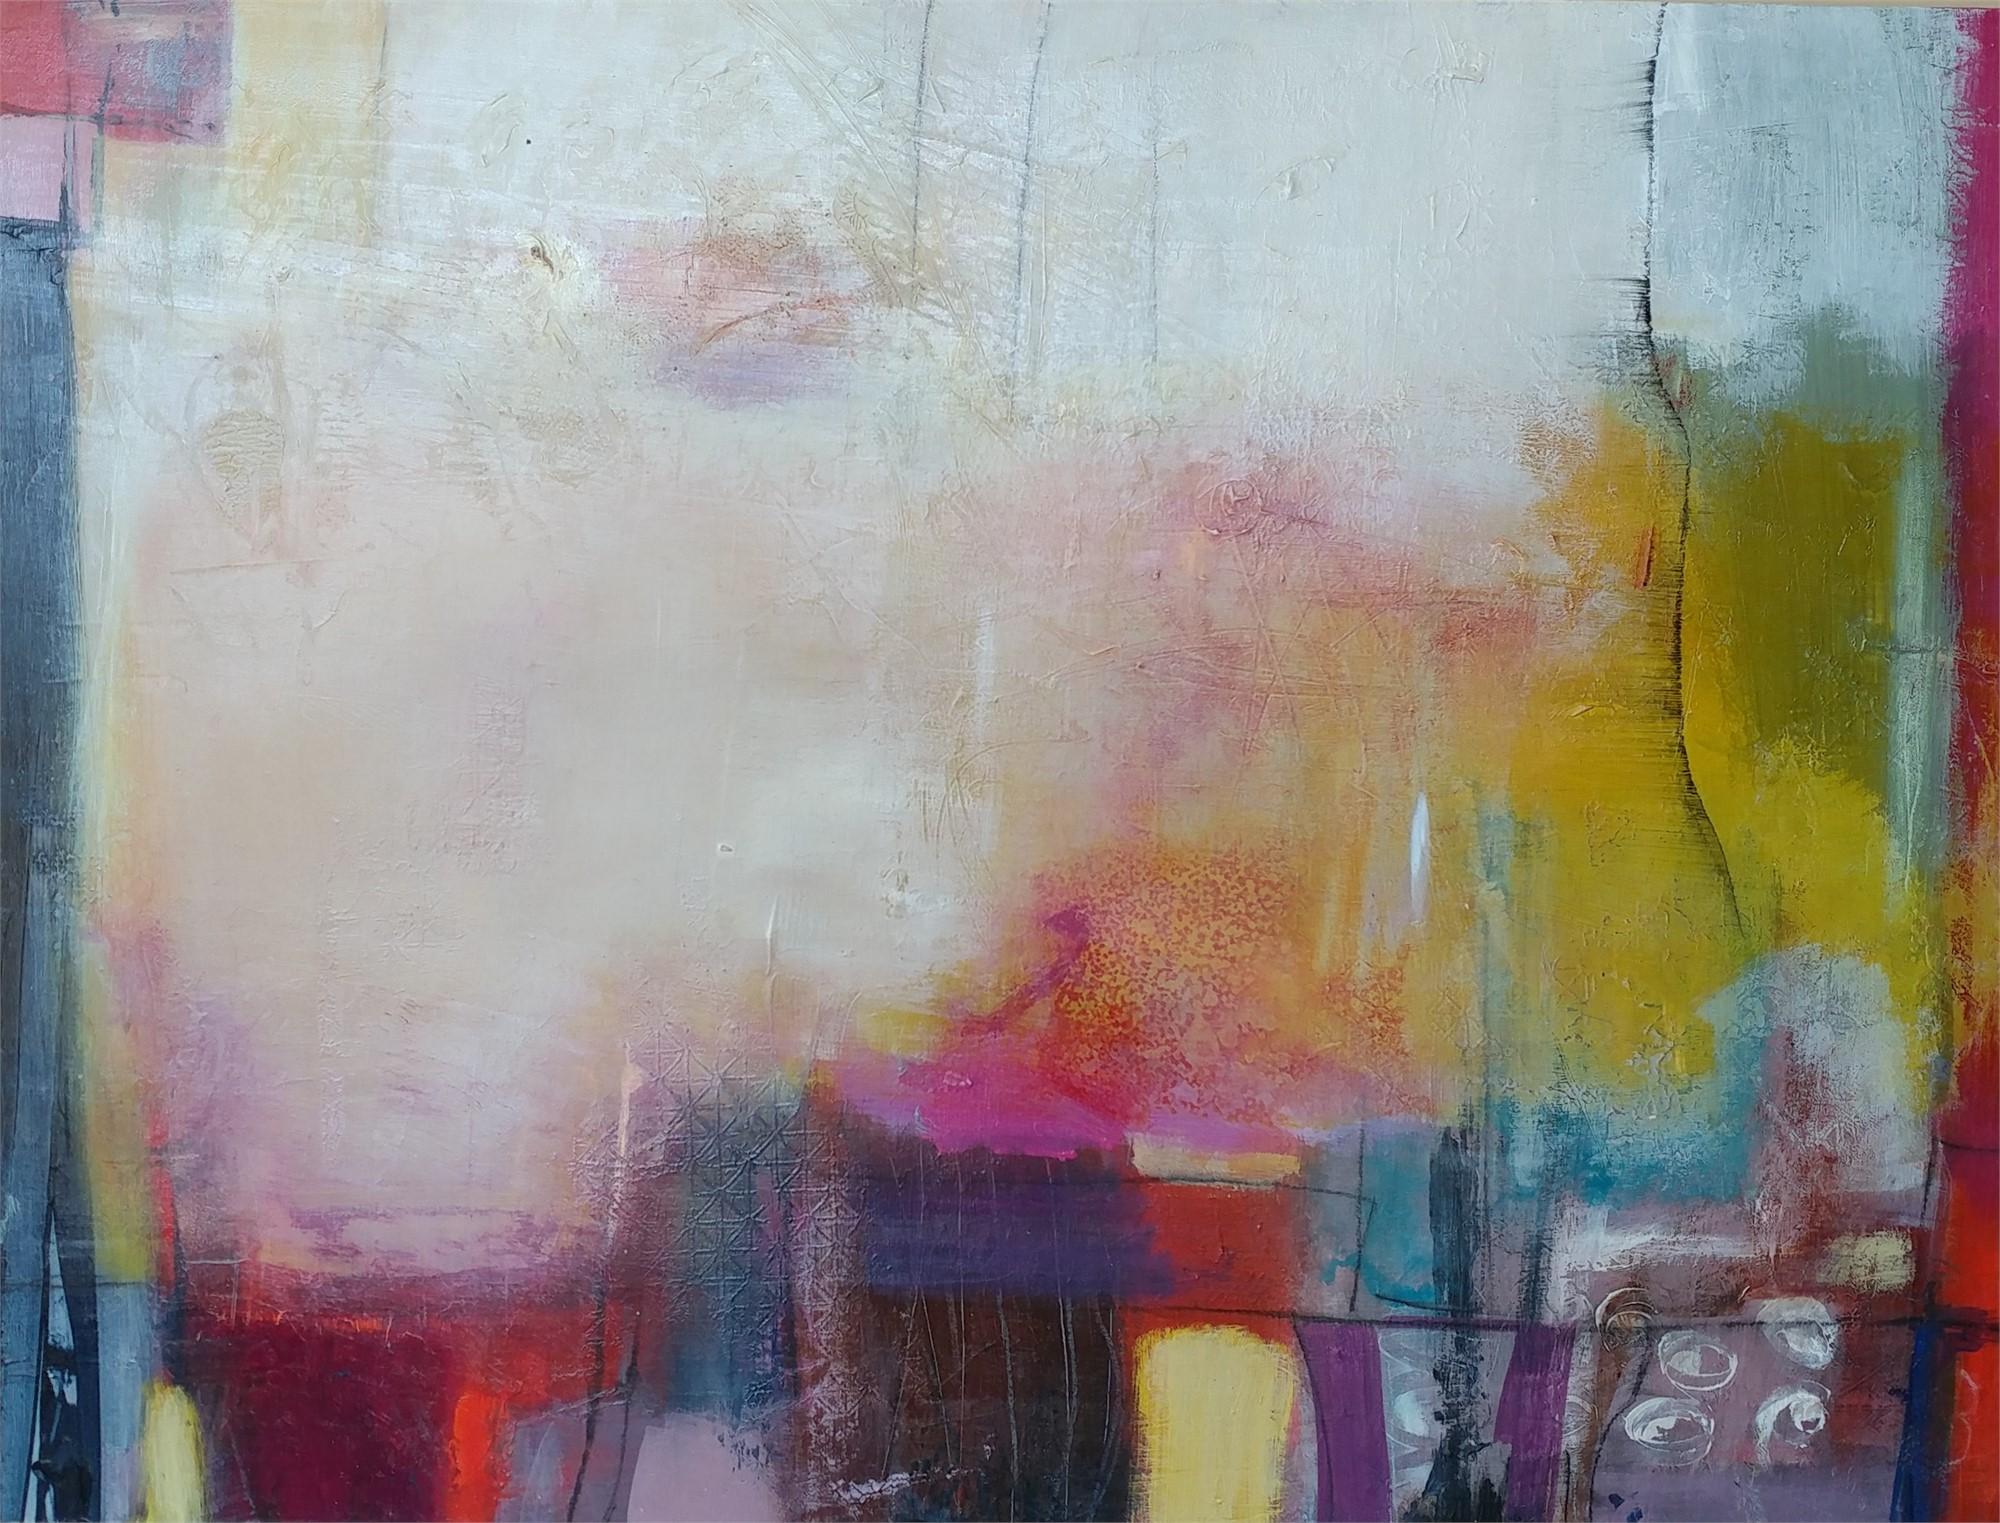 Living Dreams by Dusanka Kralj